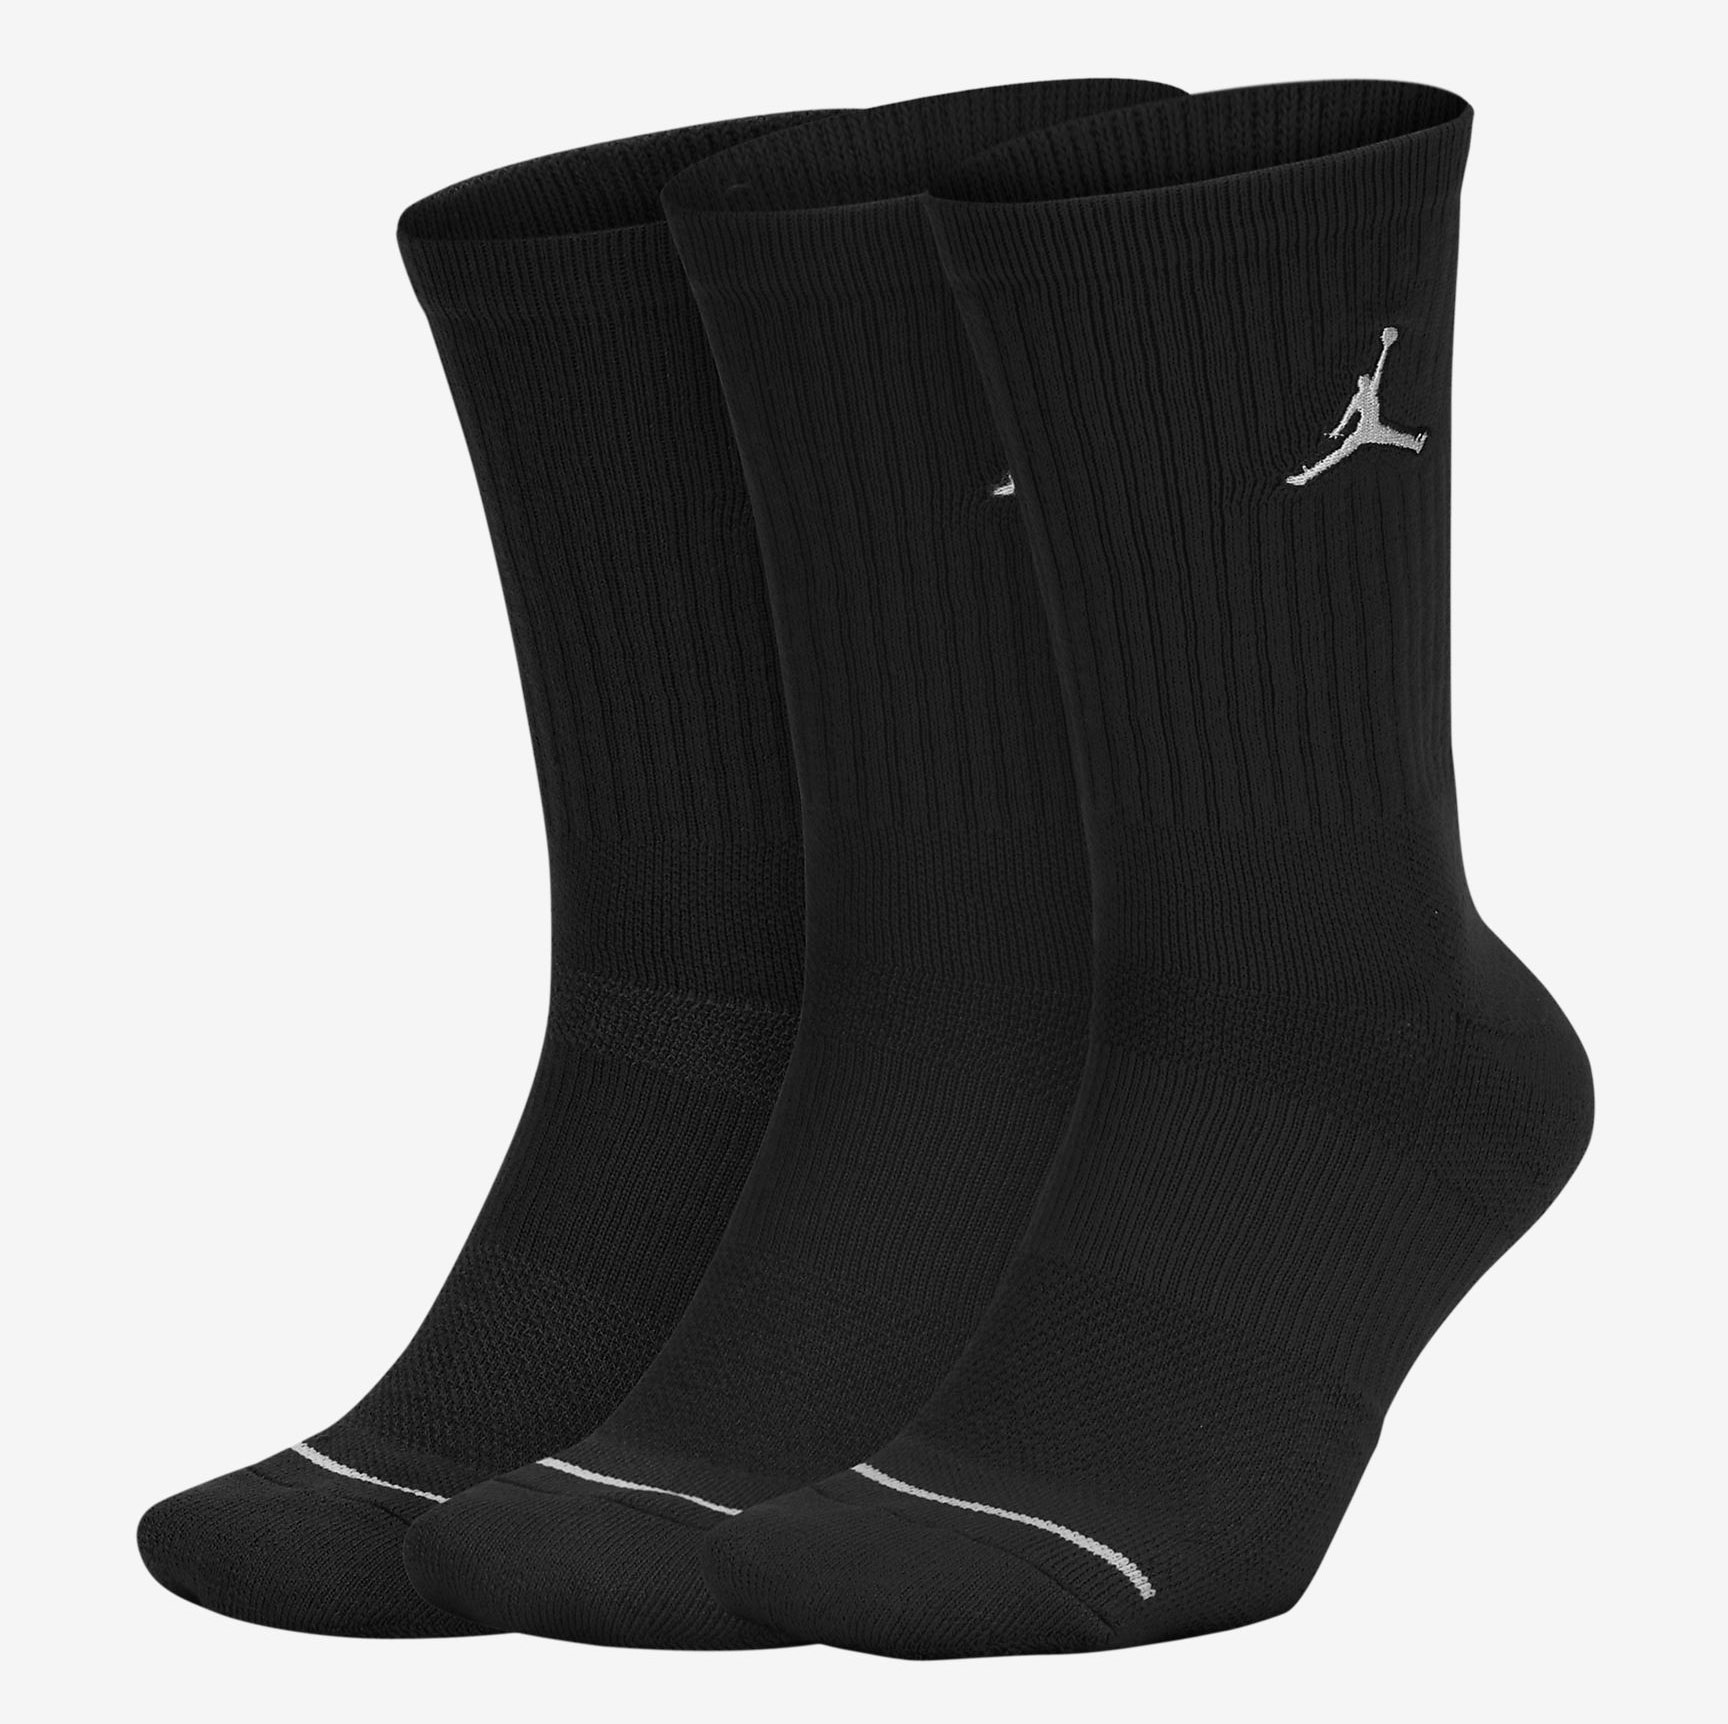 air-jordan-11-jubilee-black-white-socks